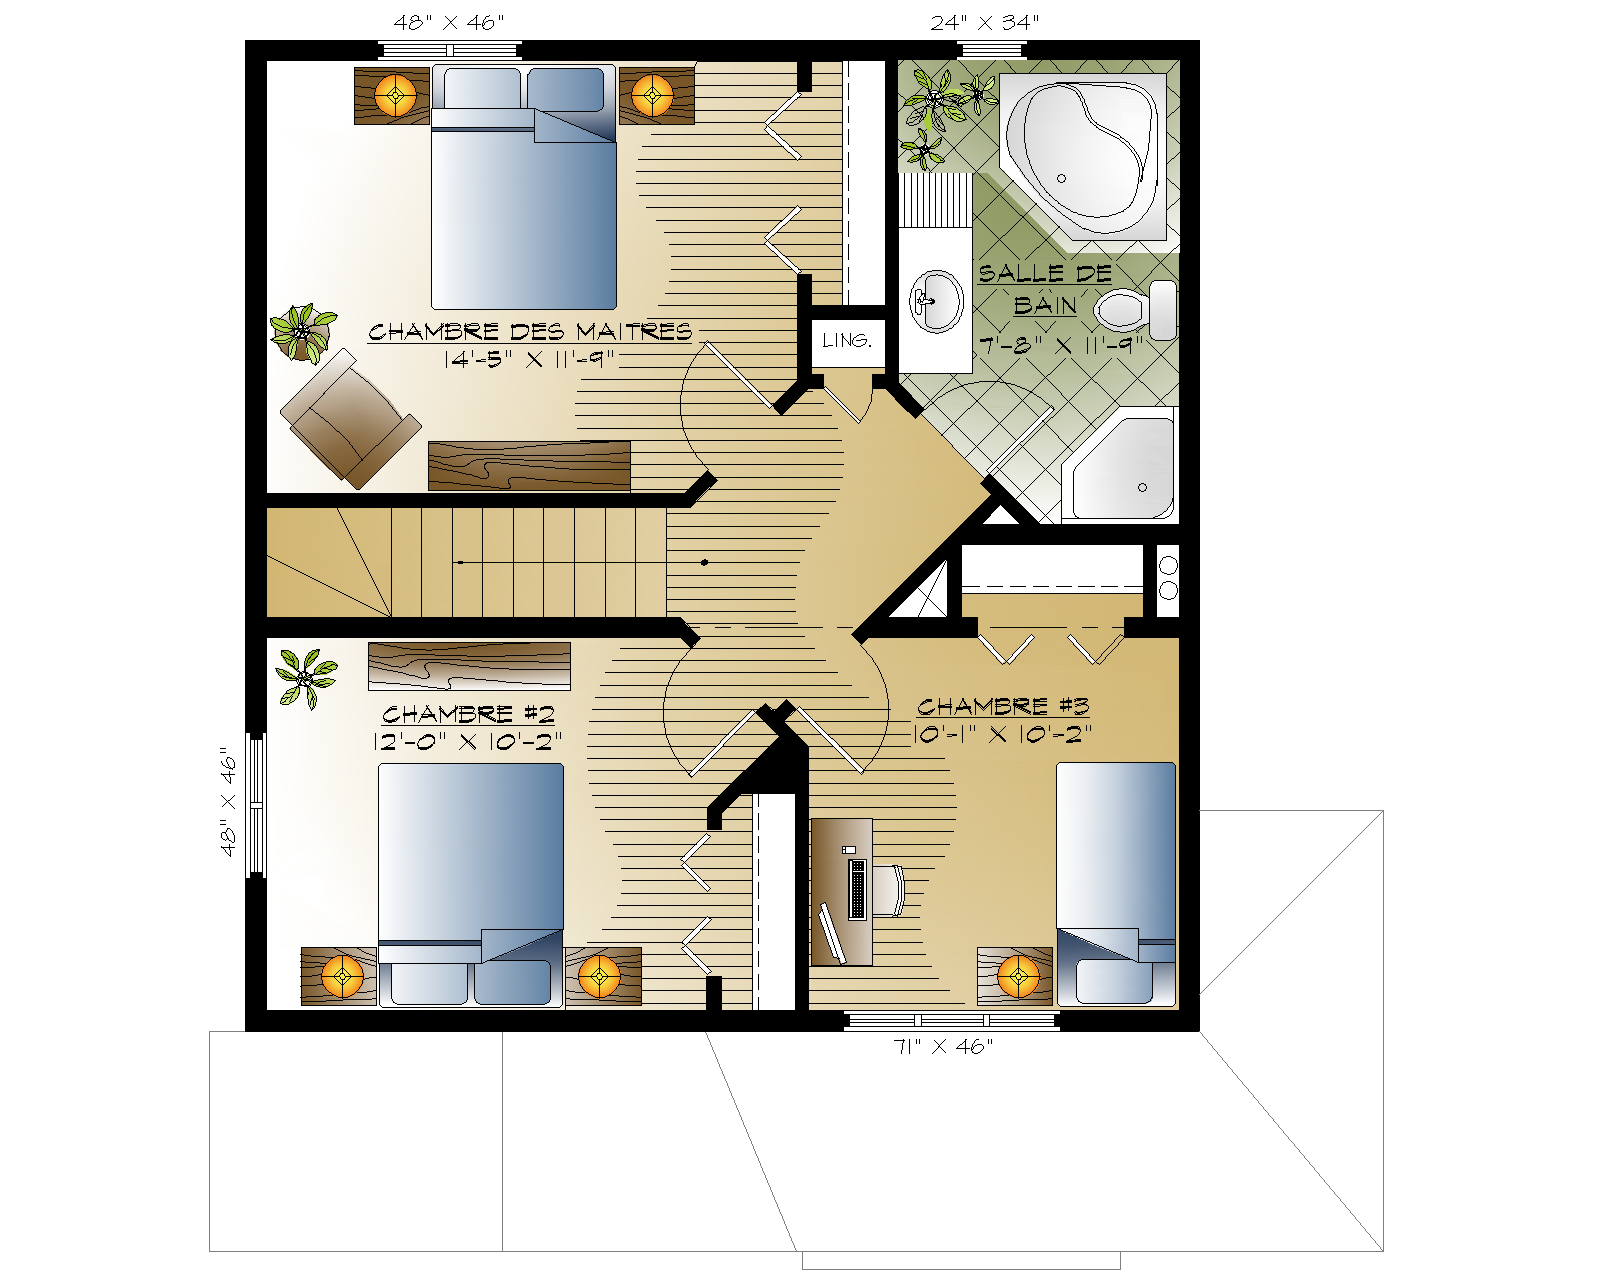 Emeraude habitations mont carleton for Maison emeraude